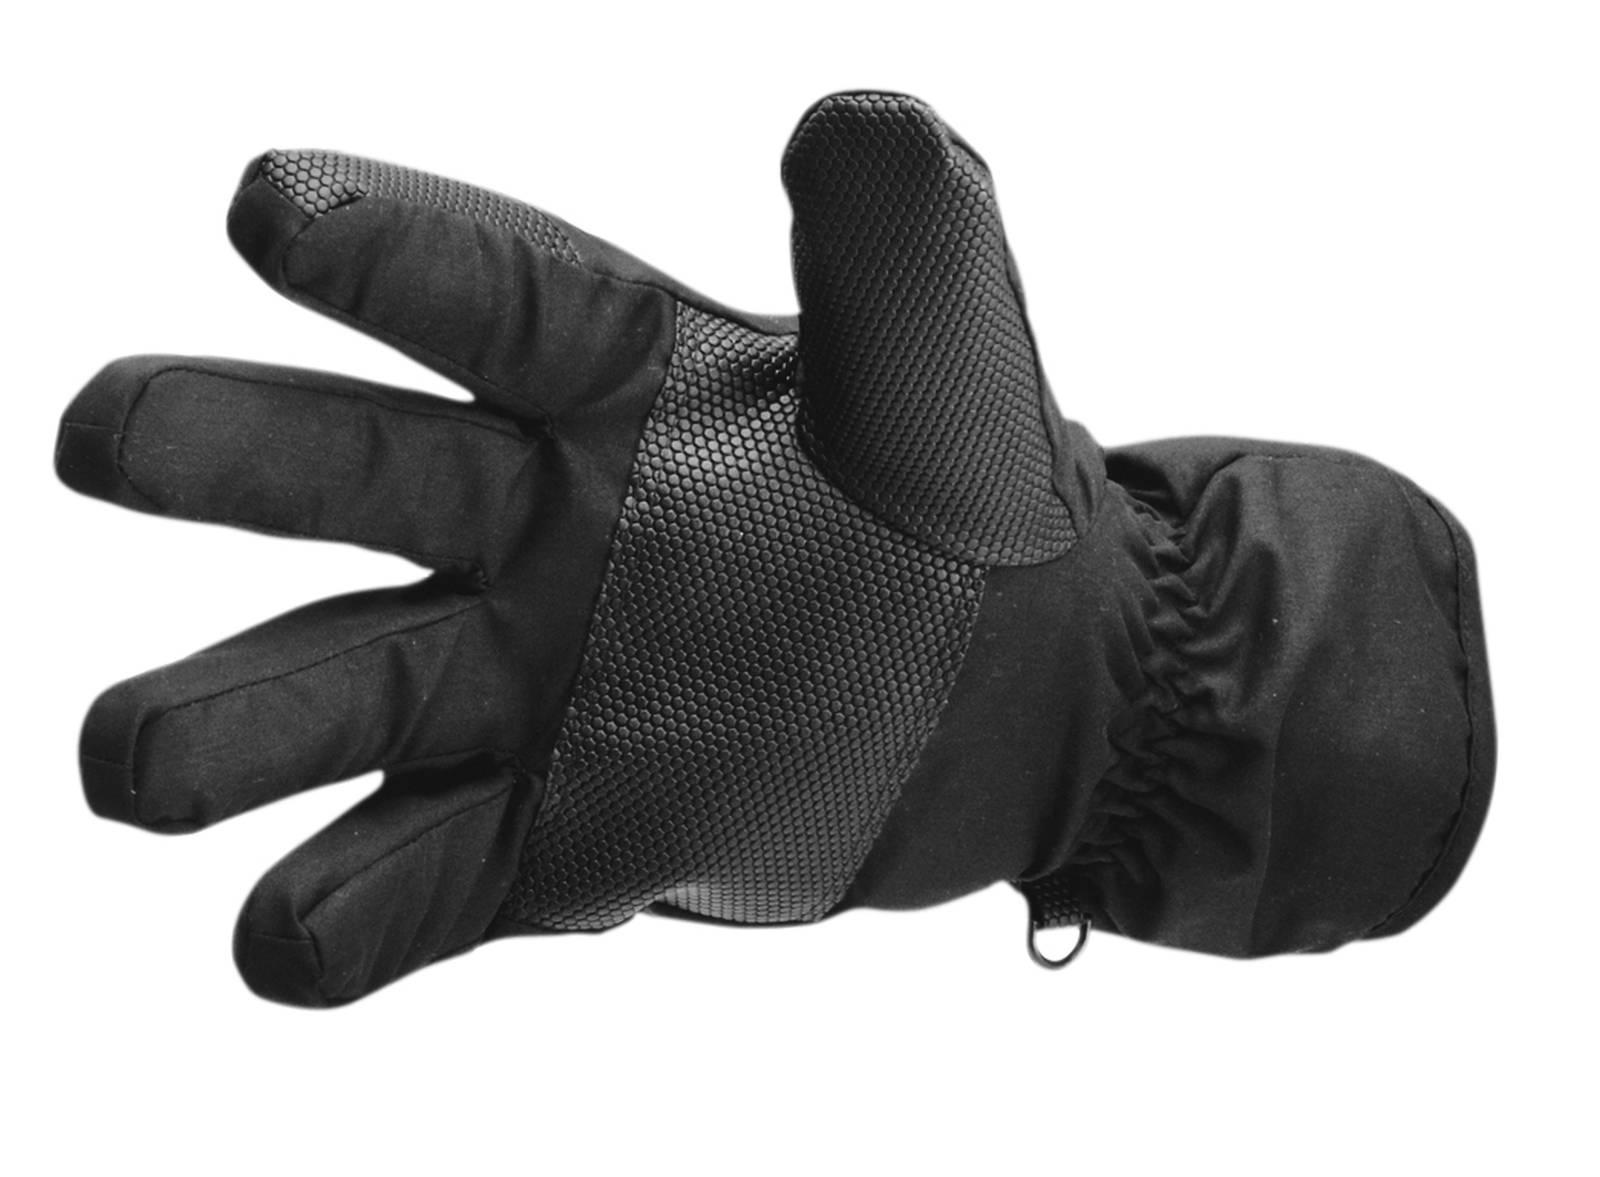 Portwest Handschoenen GL10 zwart(BK)